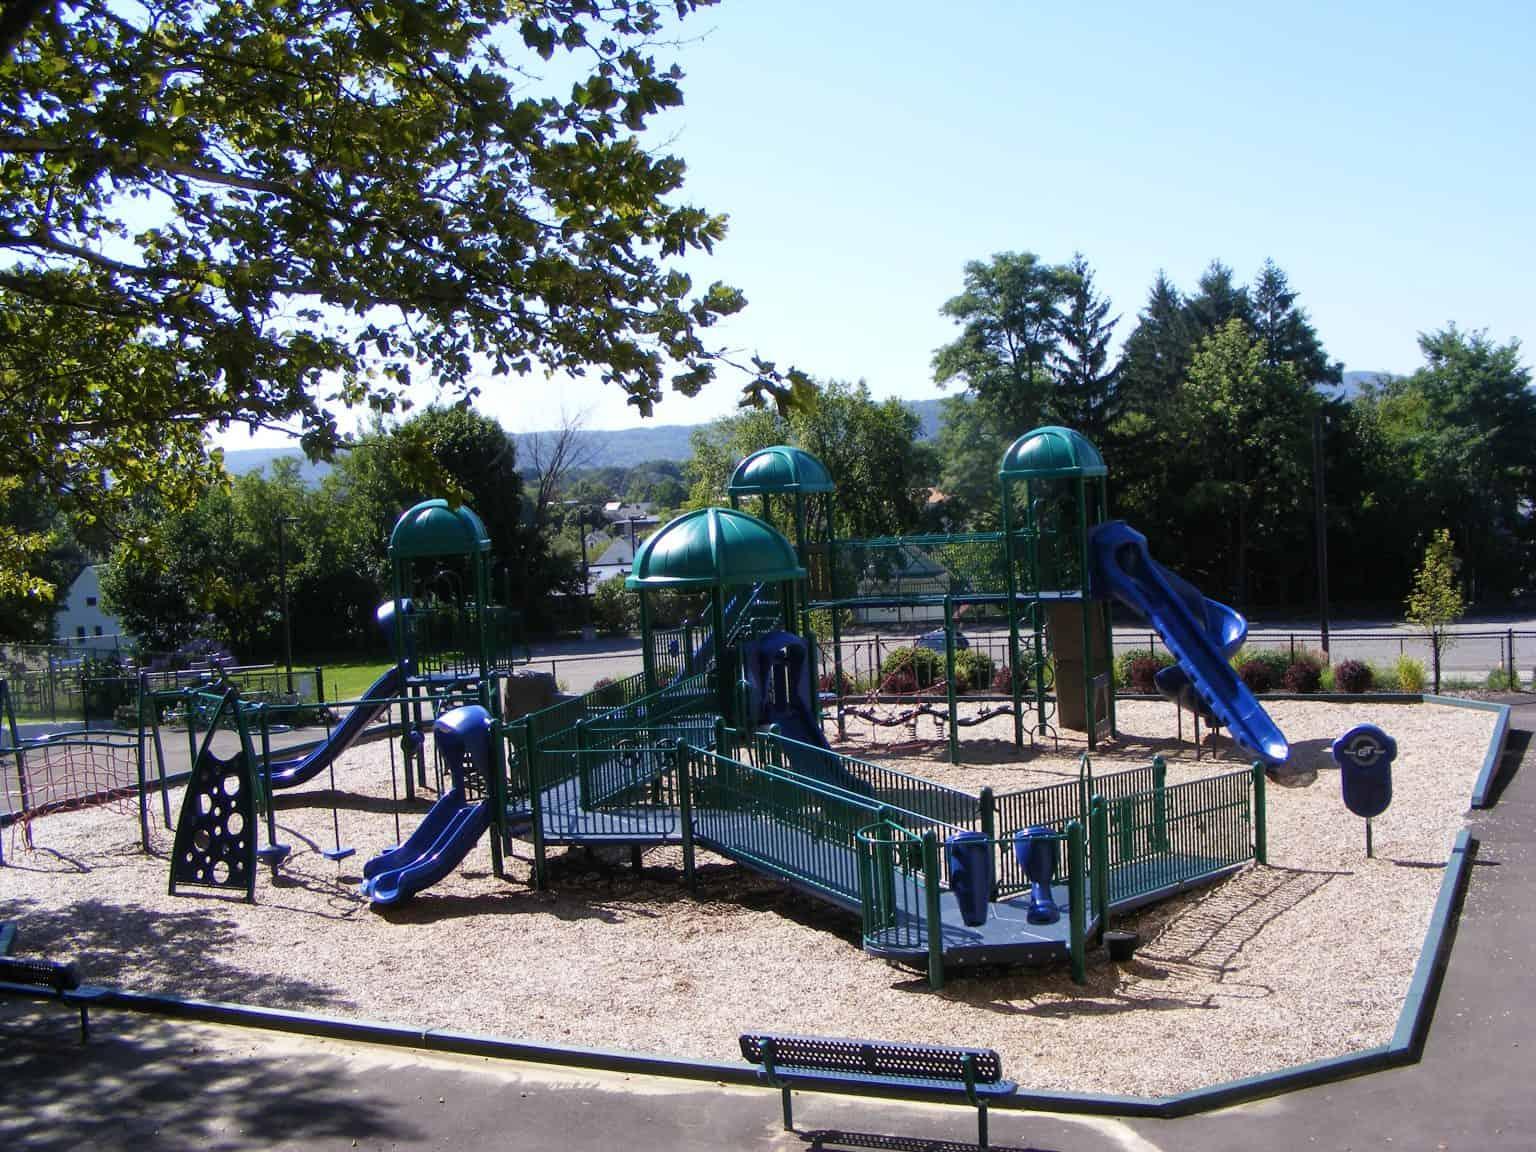 woodrow-wilson-elementary-playground-binghamton-ny_11711836145_o-1536x1152